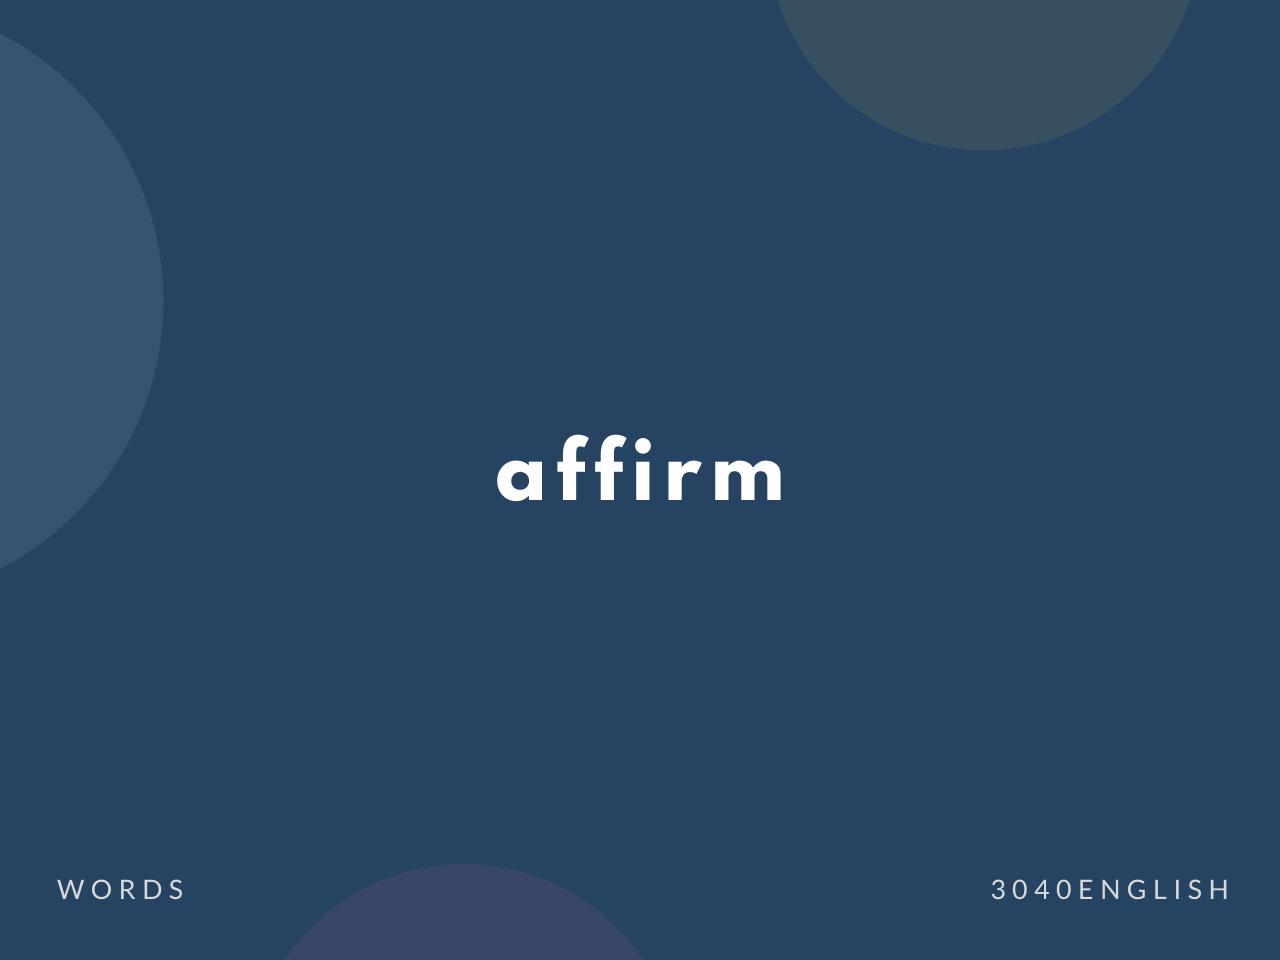 affirm の意味と簡単な使い方【音読用例文あり】